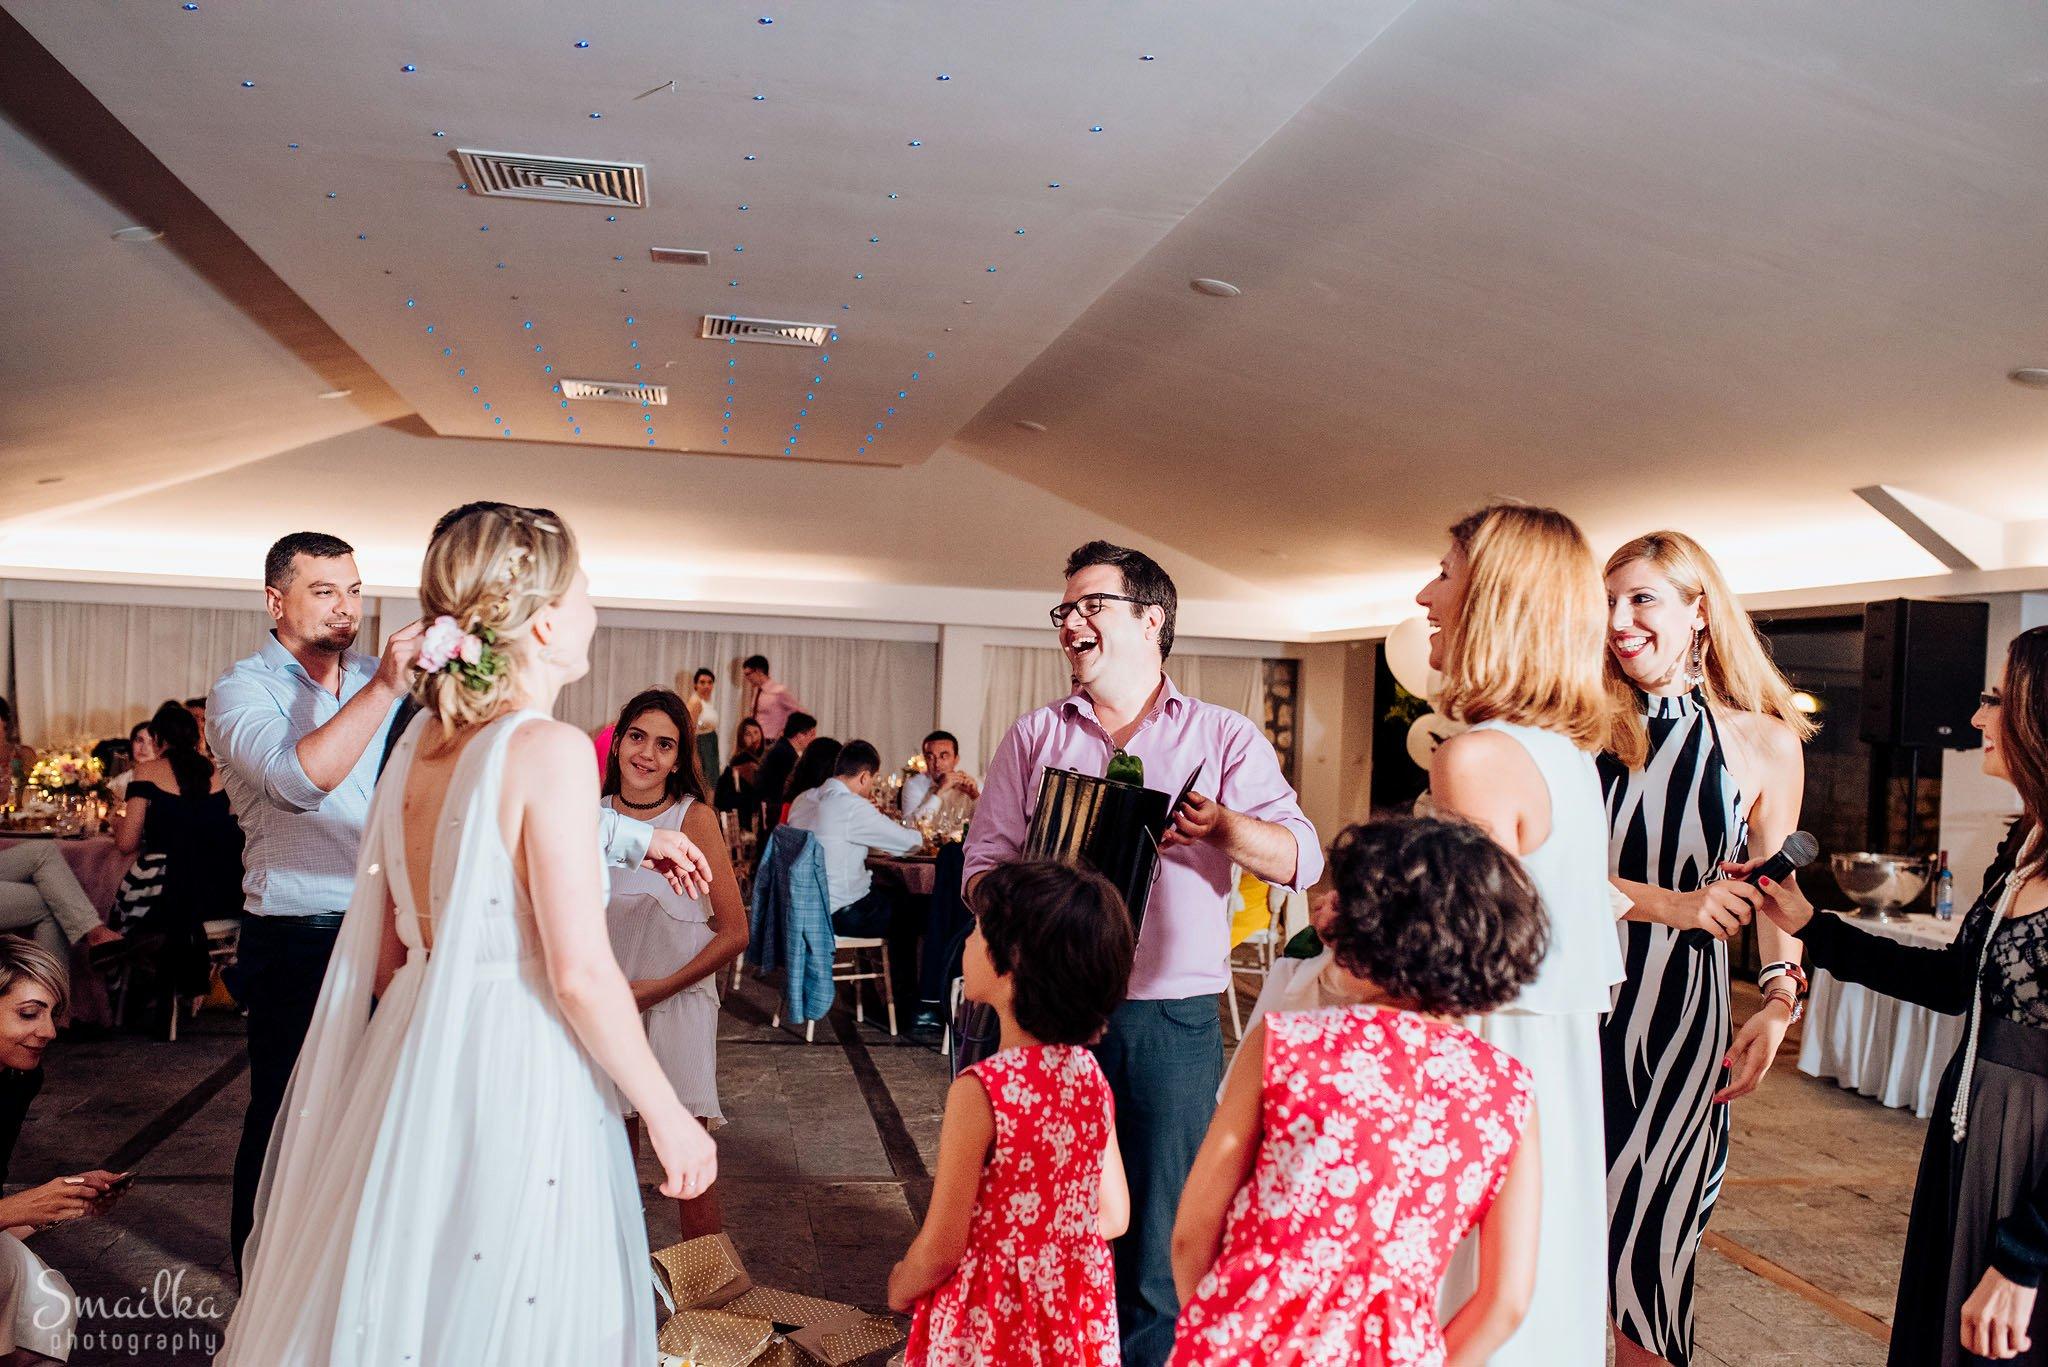 Wedding celebration of Ana and Boz at Black Sea Rama